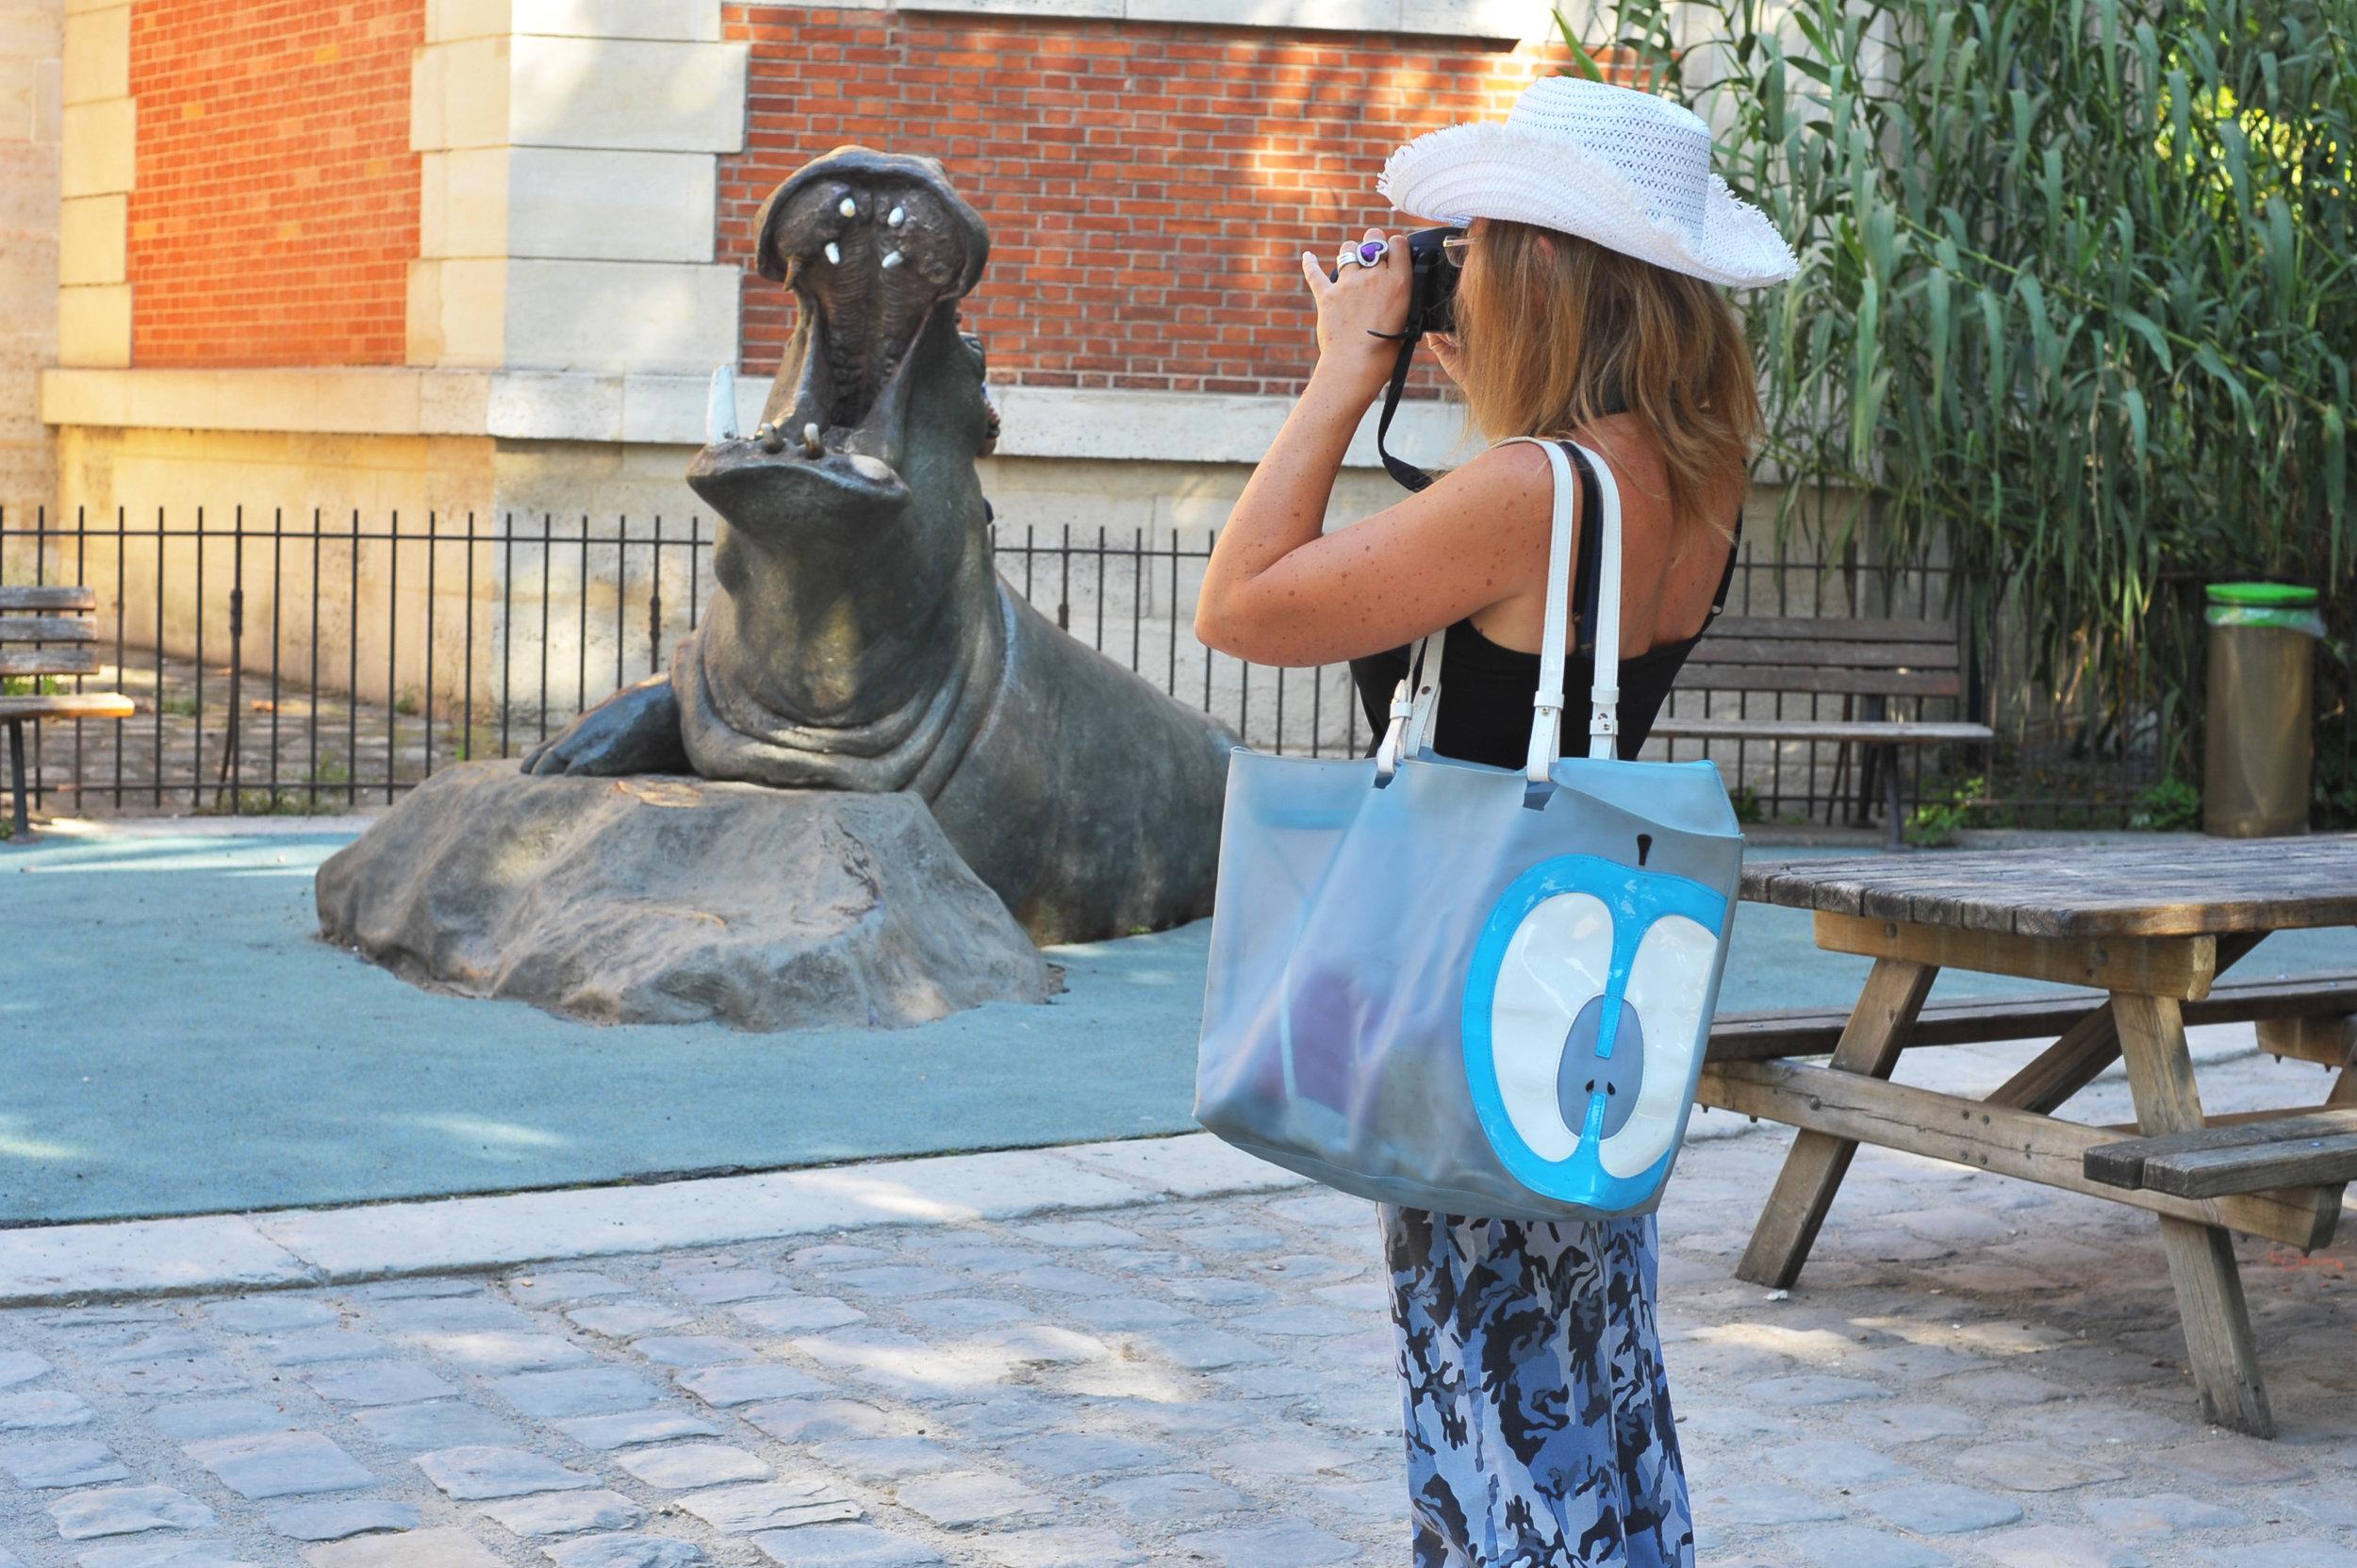 camo pants photographing walrus statue.jpg